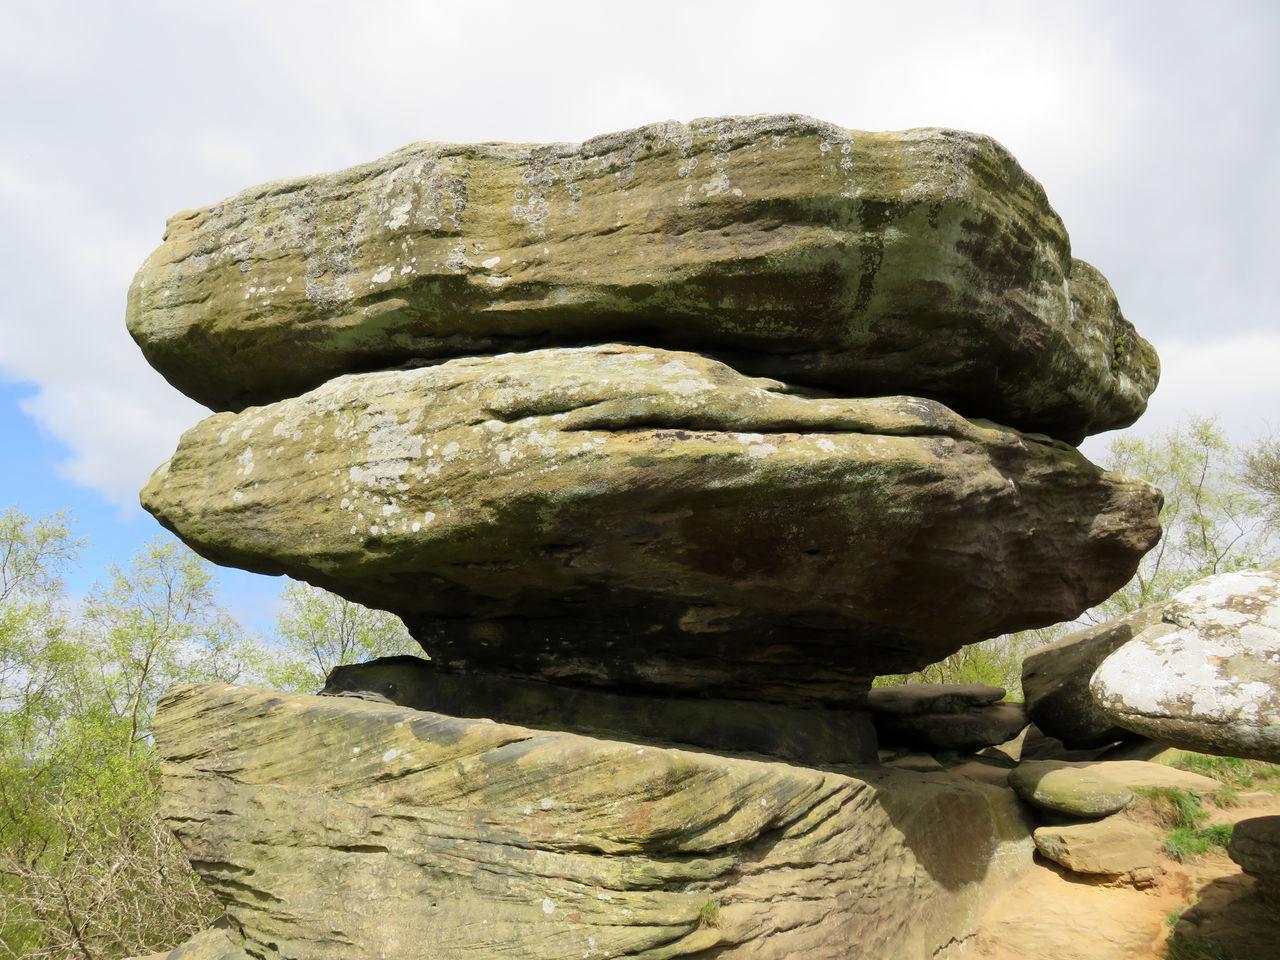 Brimham Rocks Brimham Rocks Yorkshire Brimhamrocks Yorkshire Yorkshire Dales Yorkshiredales Boulder - Rock Rock Climbing Yorkshire Dales Uk Rocks And Sky Rock Formation Balancing Rocks Rock Formations Rocks Boulder Boulders EyeEm Gallery Yorkshire Countryside EyeEm Best Shots EyeEm Best Shots - Nature Rock Face Yorkshire Landscape Rock Balancing Brimham Moor Climbing Rocks